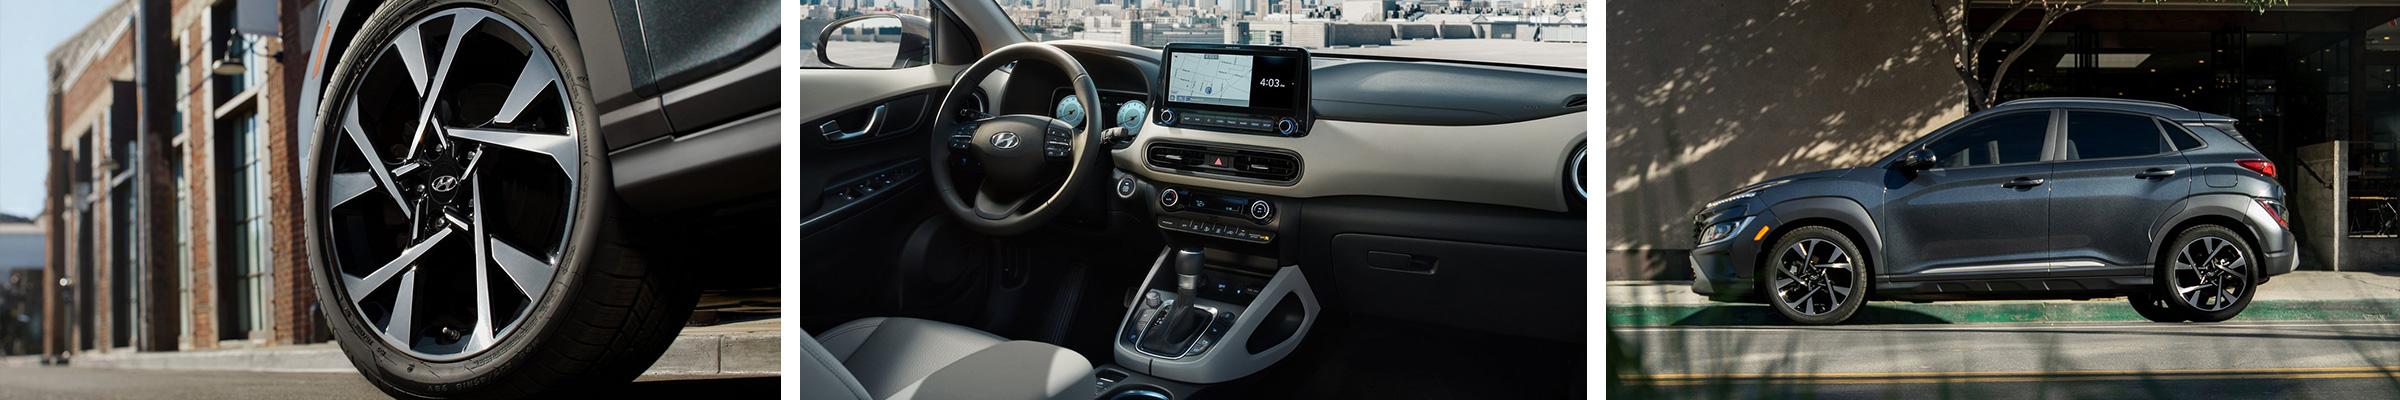 2022 Hyundai Kona For Sale Dearborn MI | Detroit